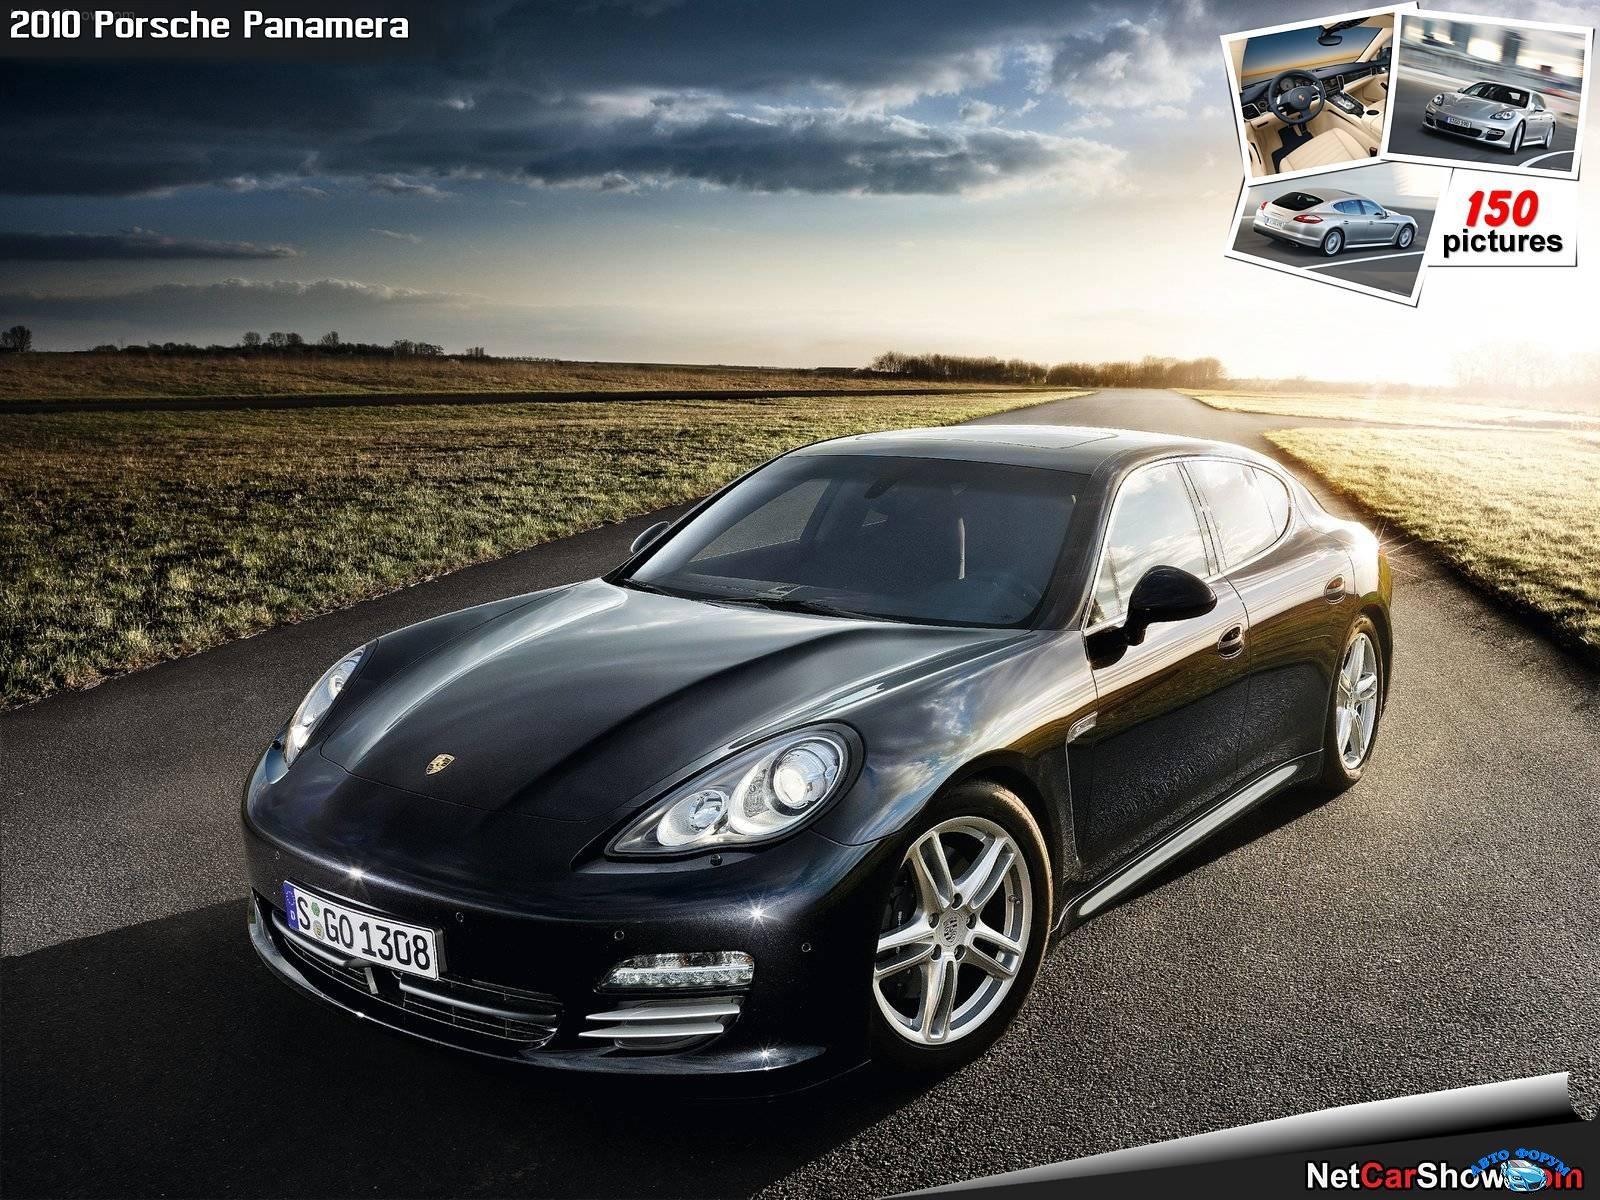 Porsche-Panamera-2010-1600-05.jpg